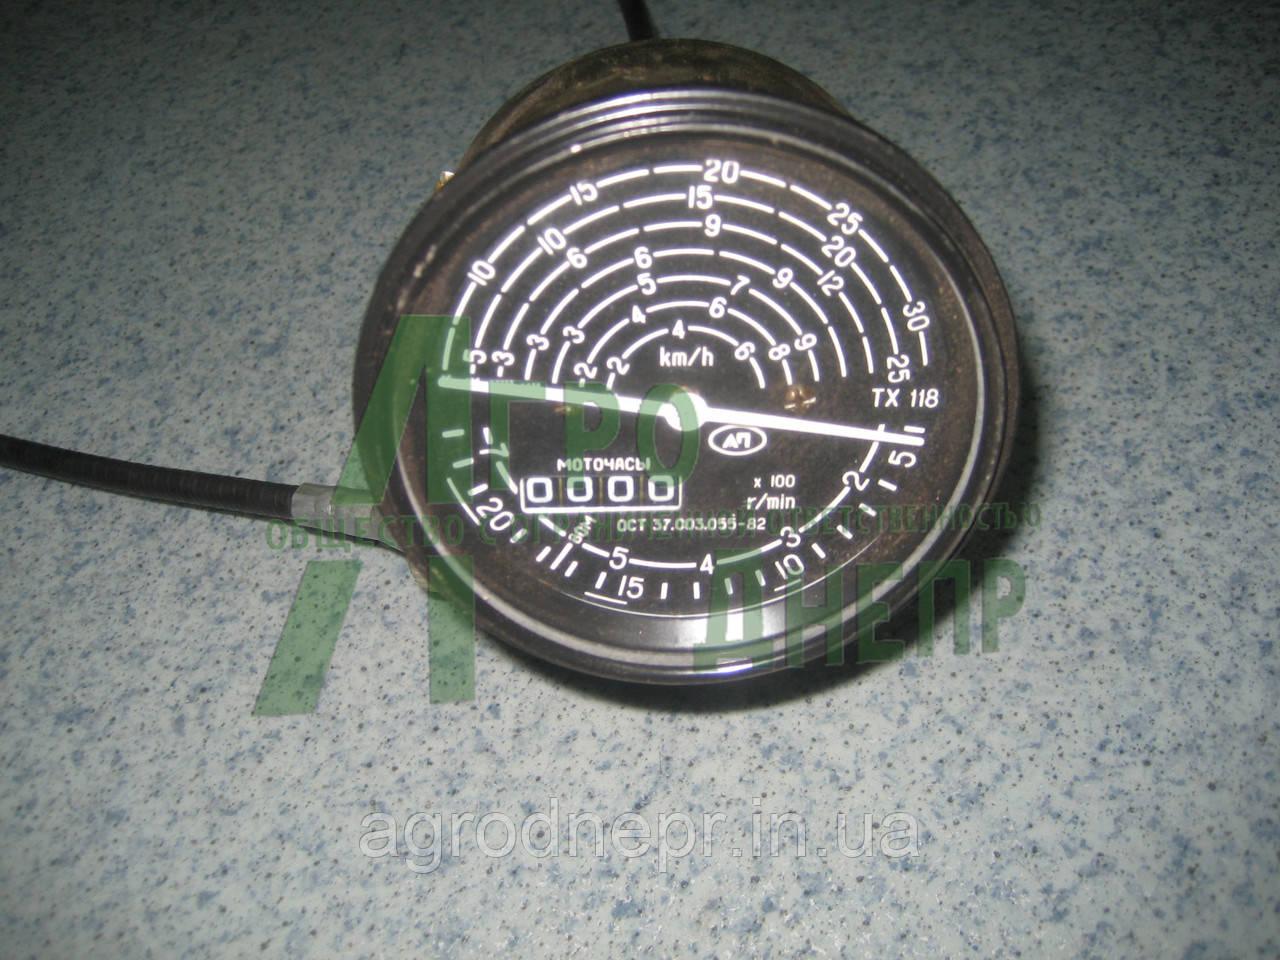 Тахоспидометр с приводом ТХ-118 на трактор ЮМЗ